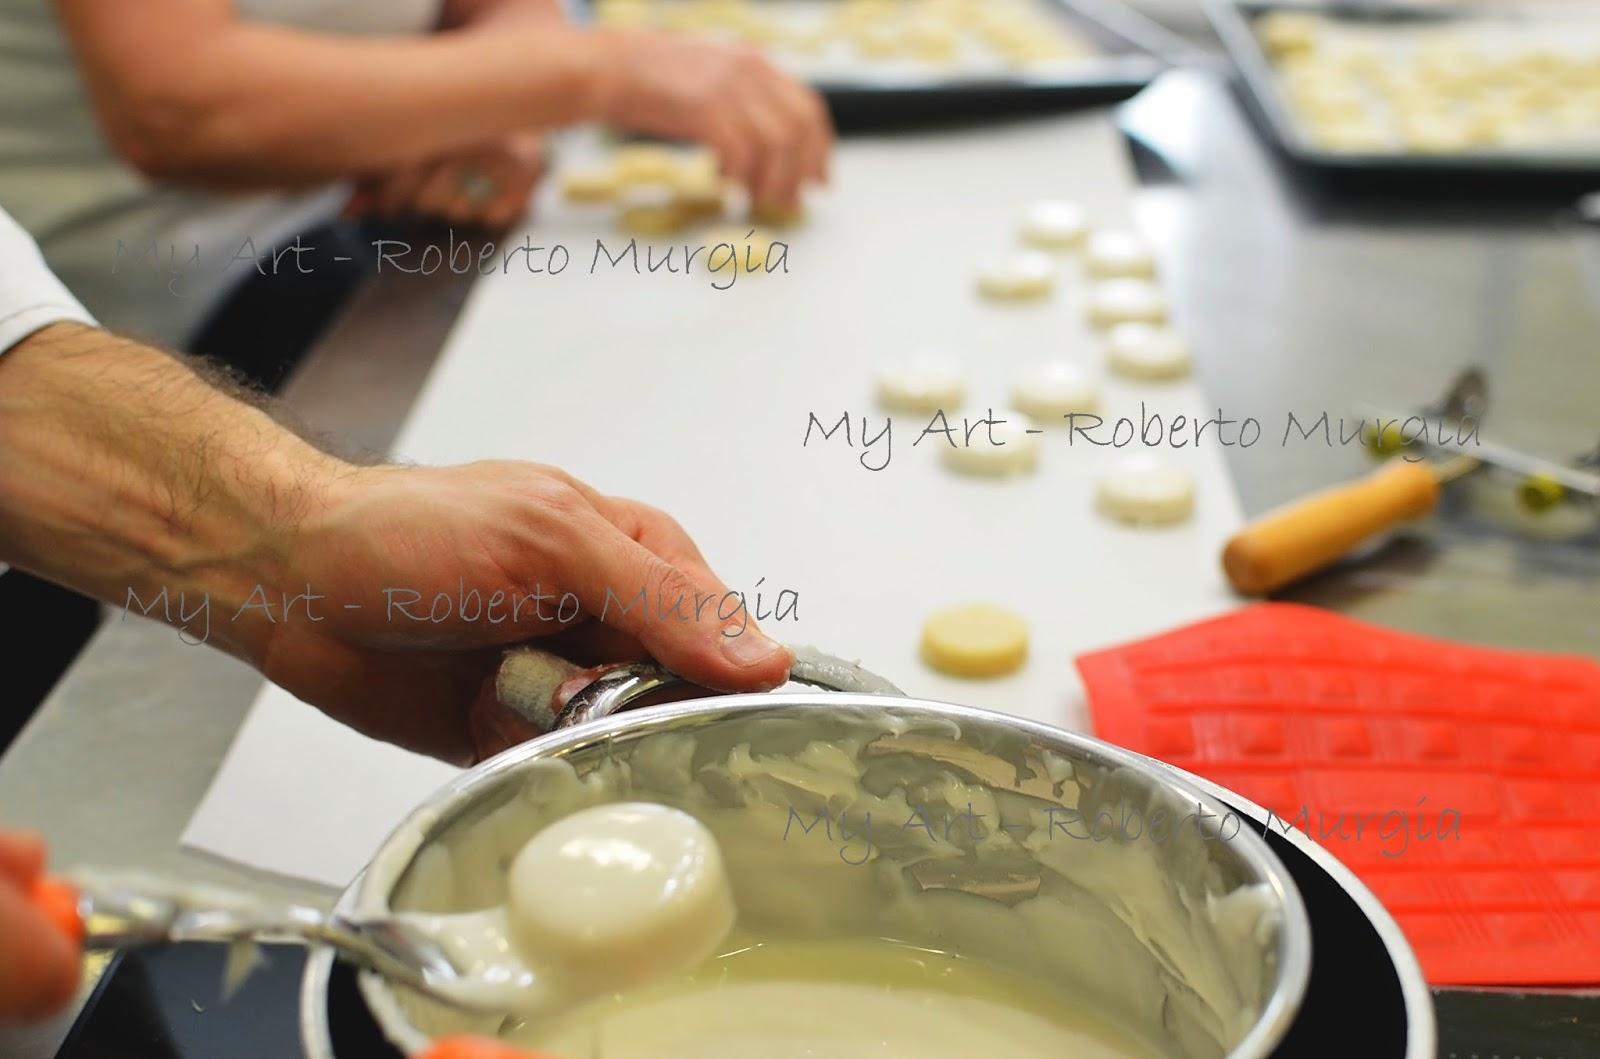 Immagini Di Cucina Italiana | madgeweb.com idee di interior design